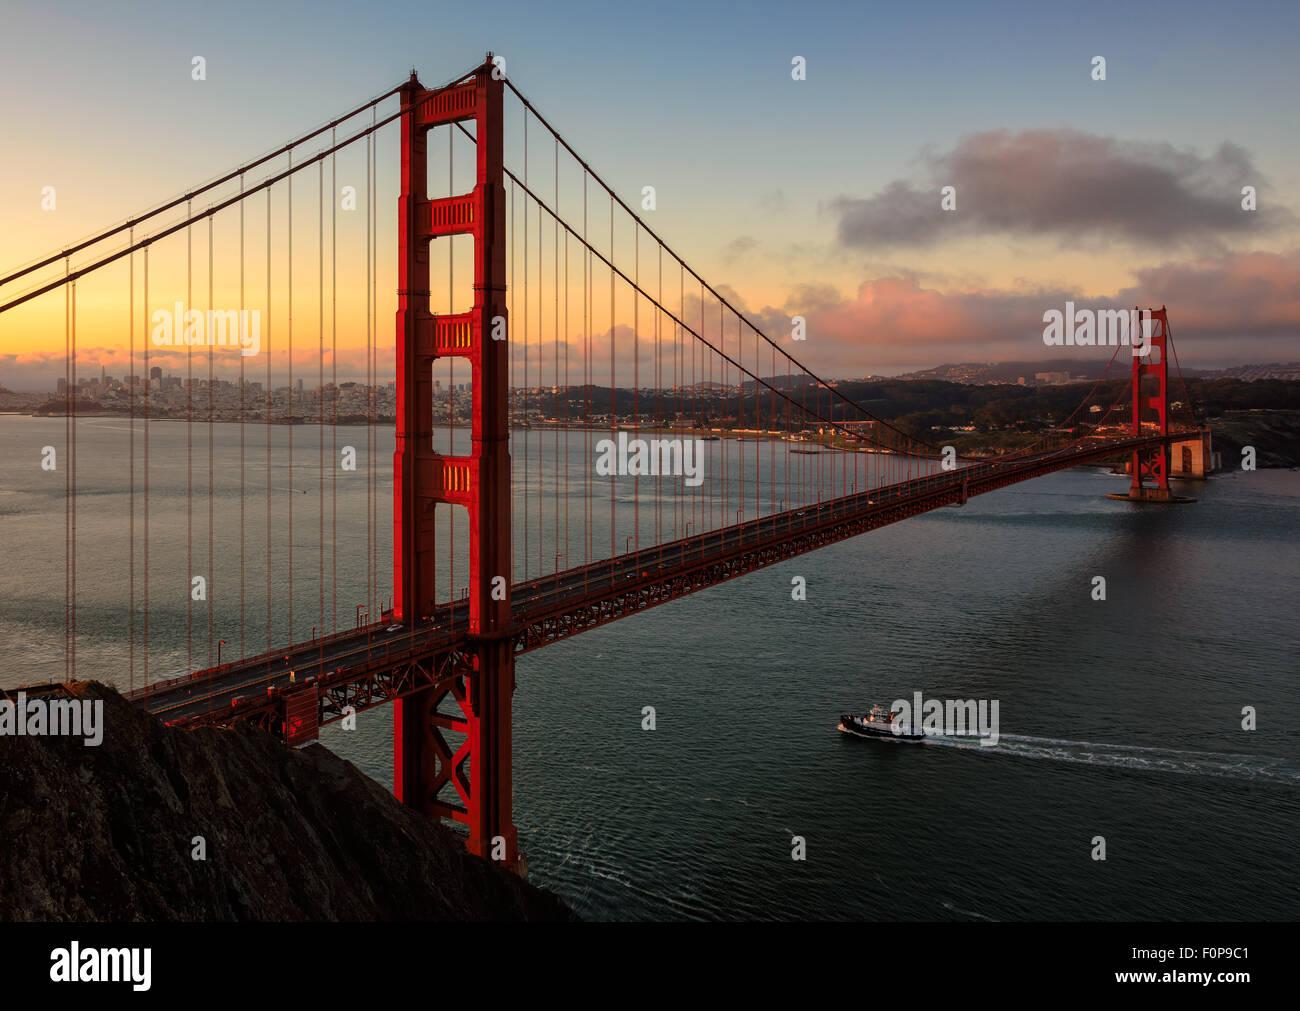 Golden Gate Bridge early morning at sunrise in San Francisco, California Stock Photo